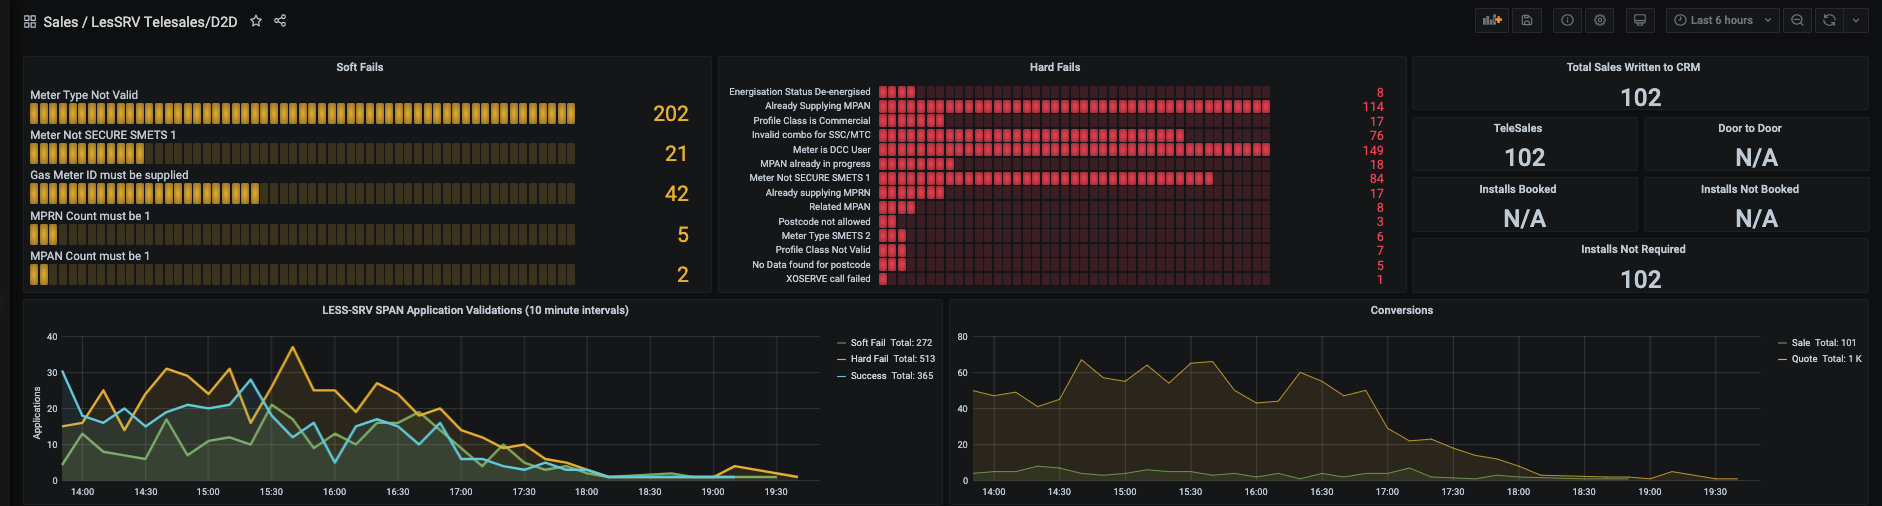 Utilita real-time sales dashboard